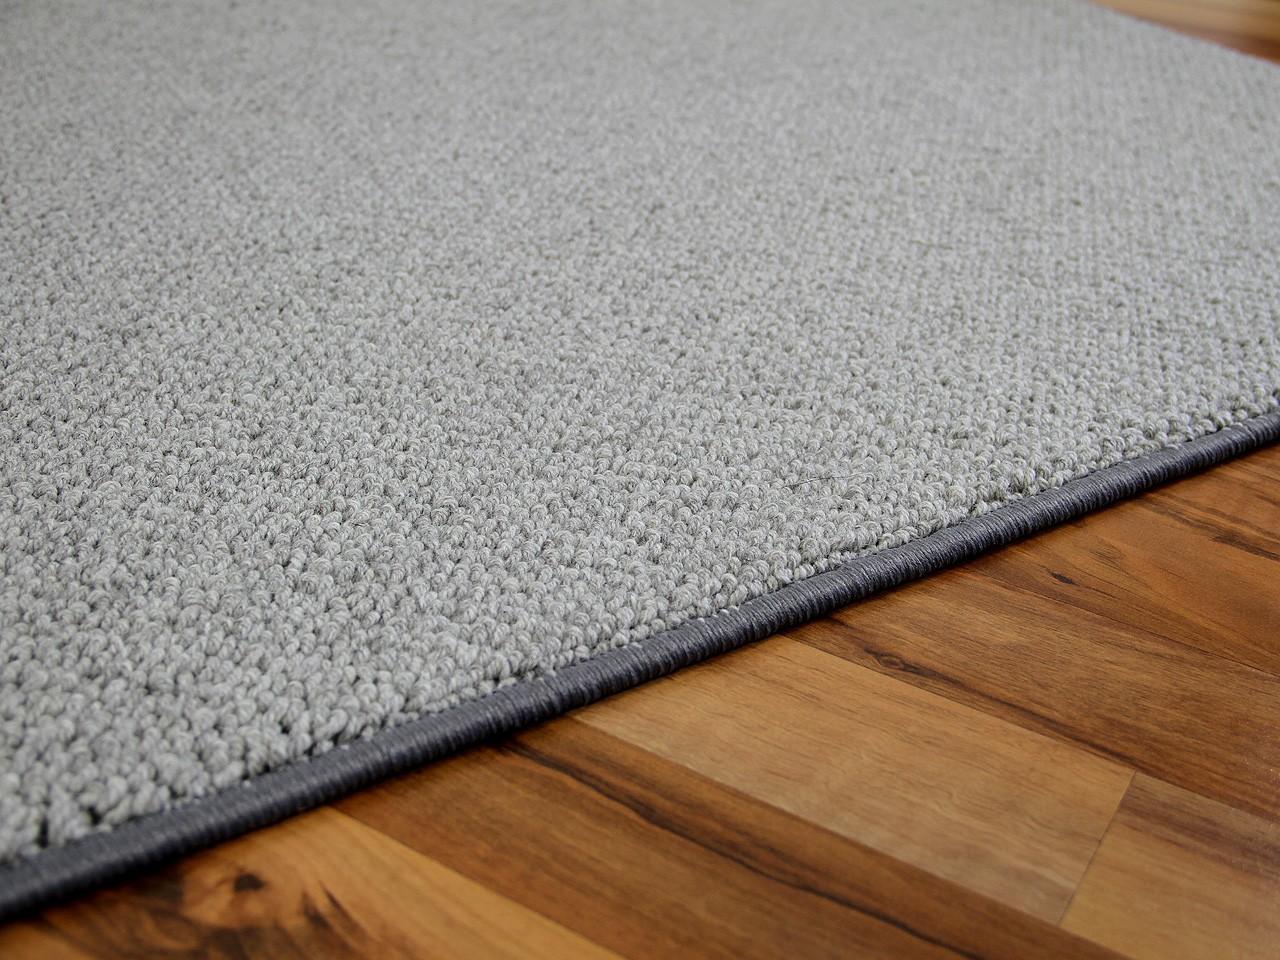 natur teppich luxus berber venice hellgrau teppiche sisal und naturteppiche berber teppiche. Black Bedroom Furniture Sets. Home Design Ideas